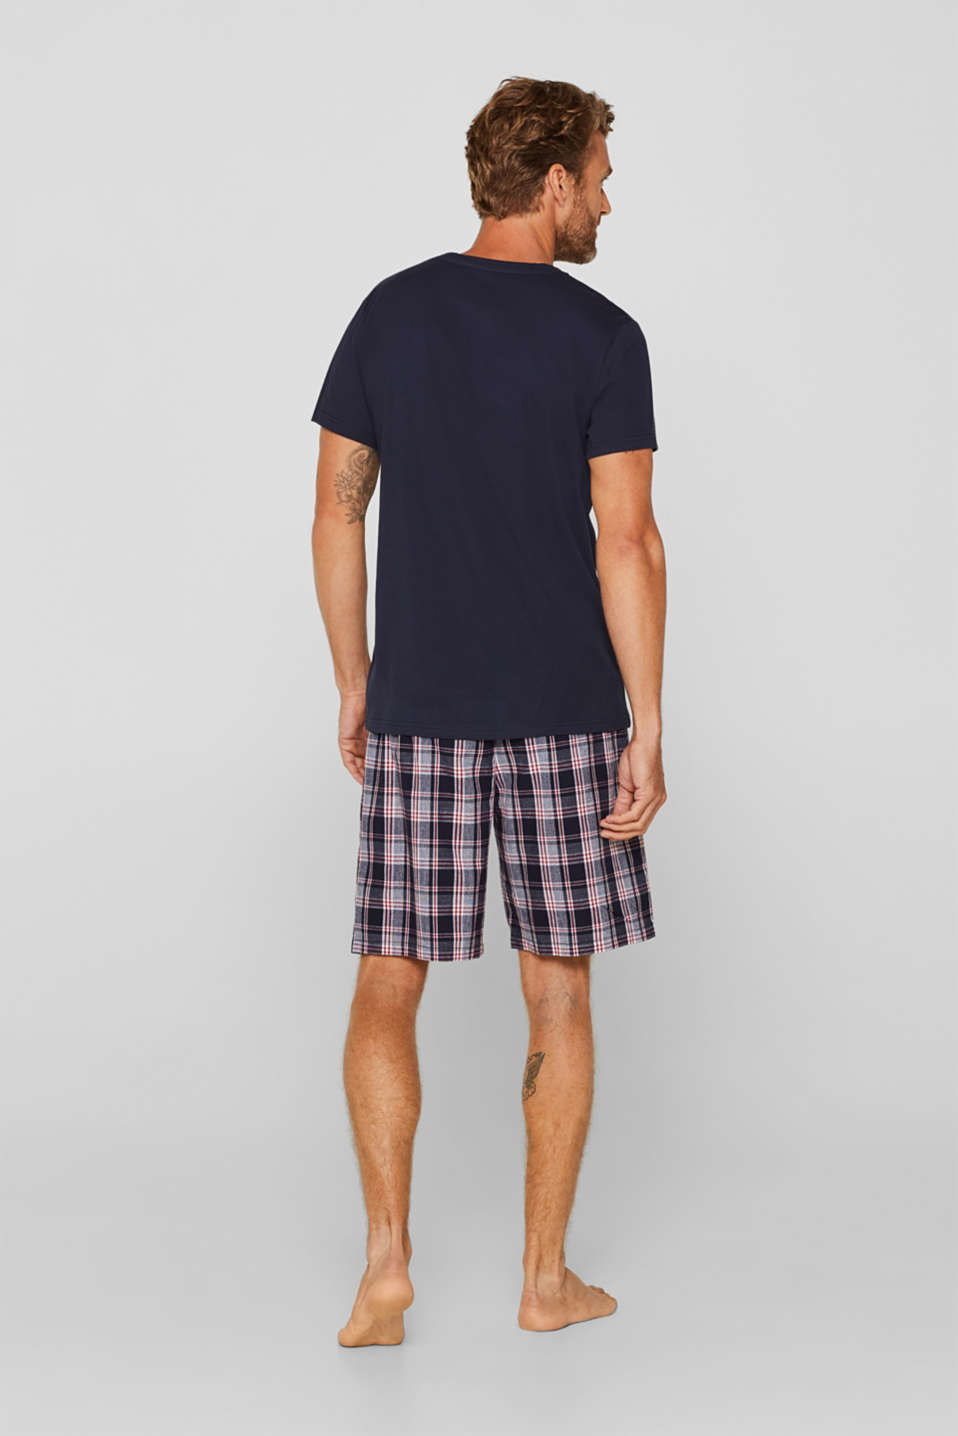 Jersey/fabric pyjamas, 100% cotton, NAVY, detail image number 1